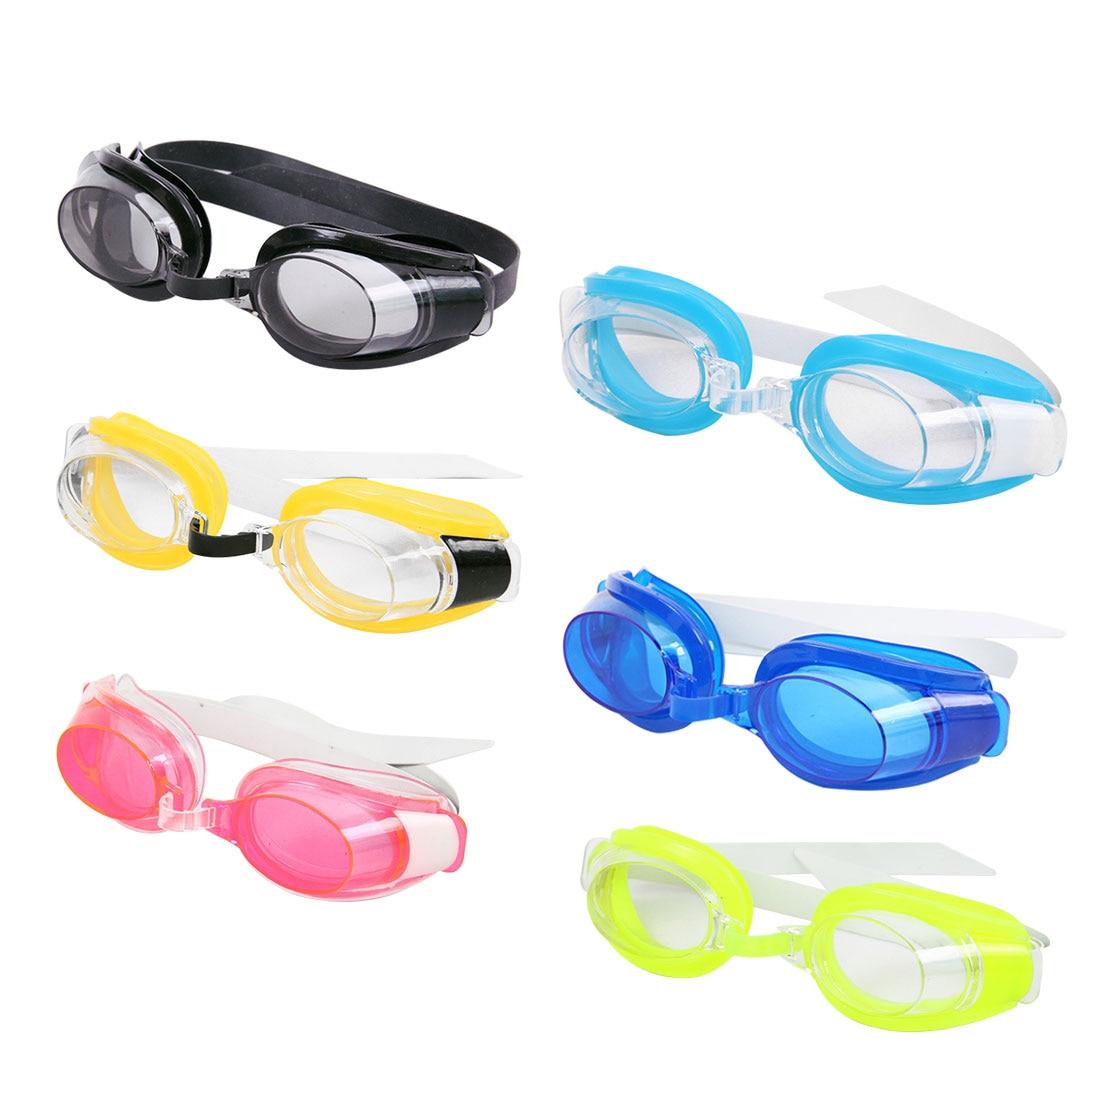 Hot Sell Kids Children Waterproof Anti fog Swimming Glasses Outdoor Sports Swimming Pool Eyewear & Ear Plugs Nose Clip